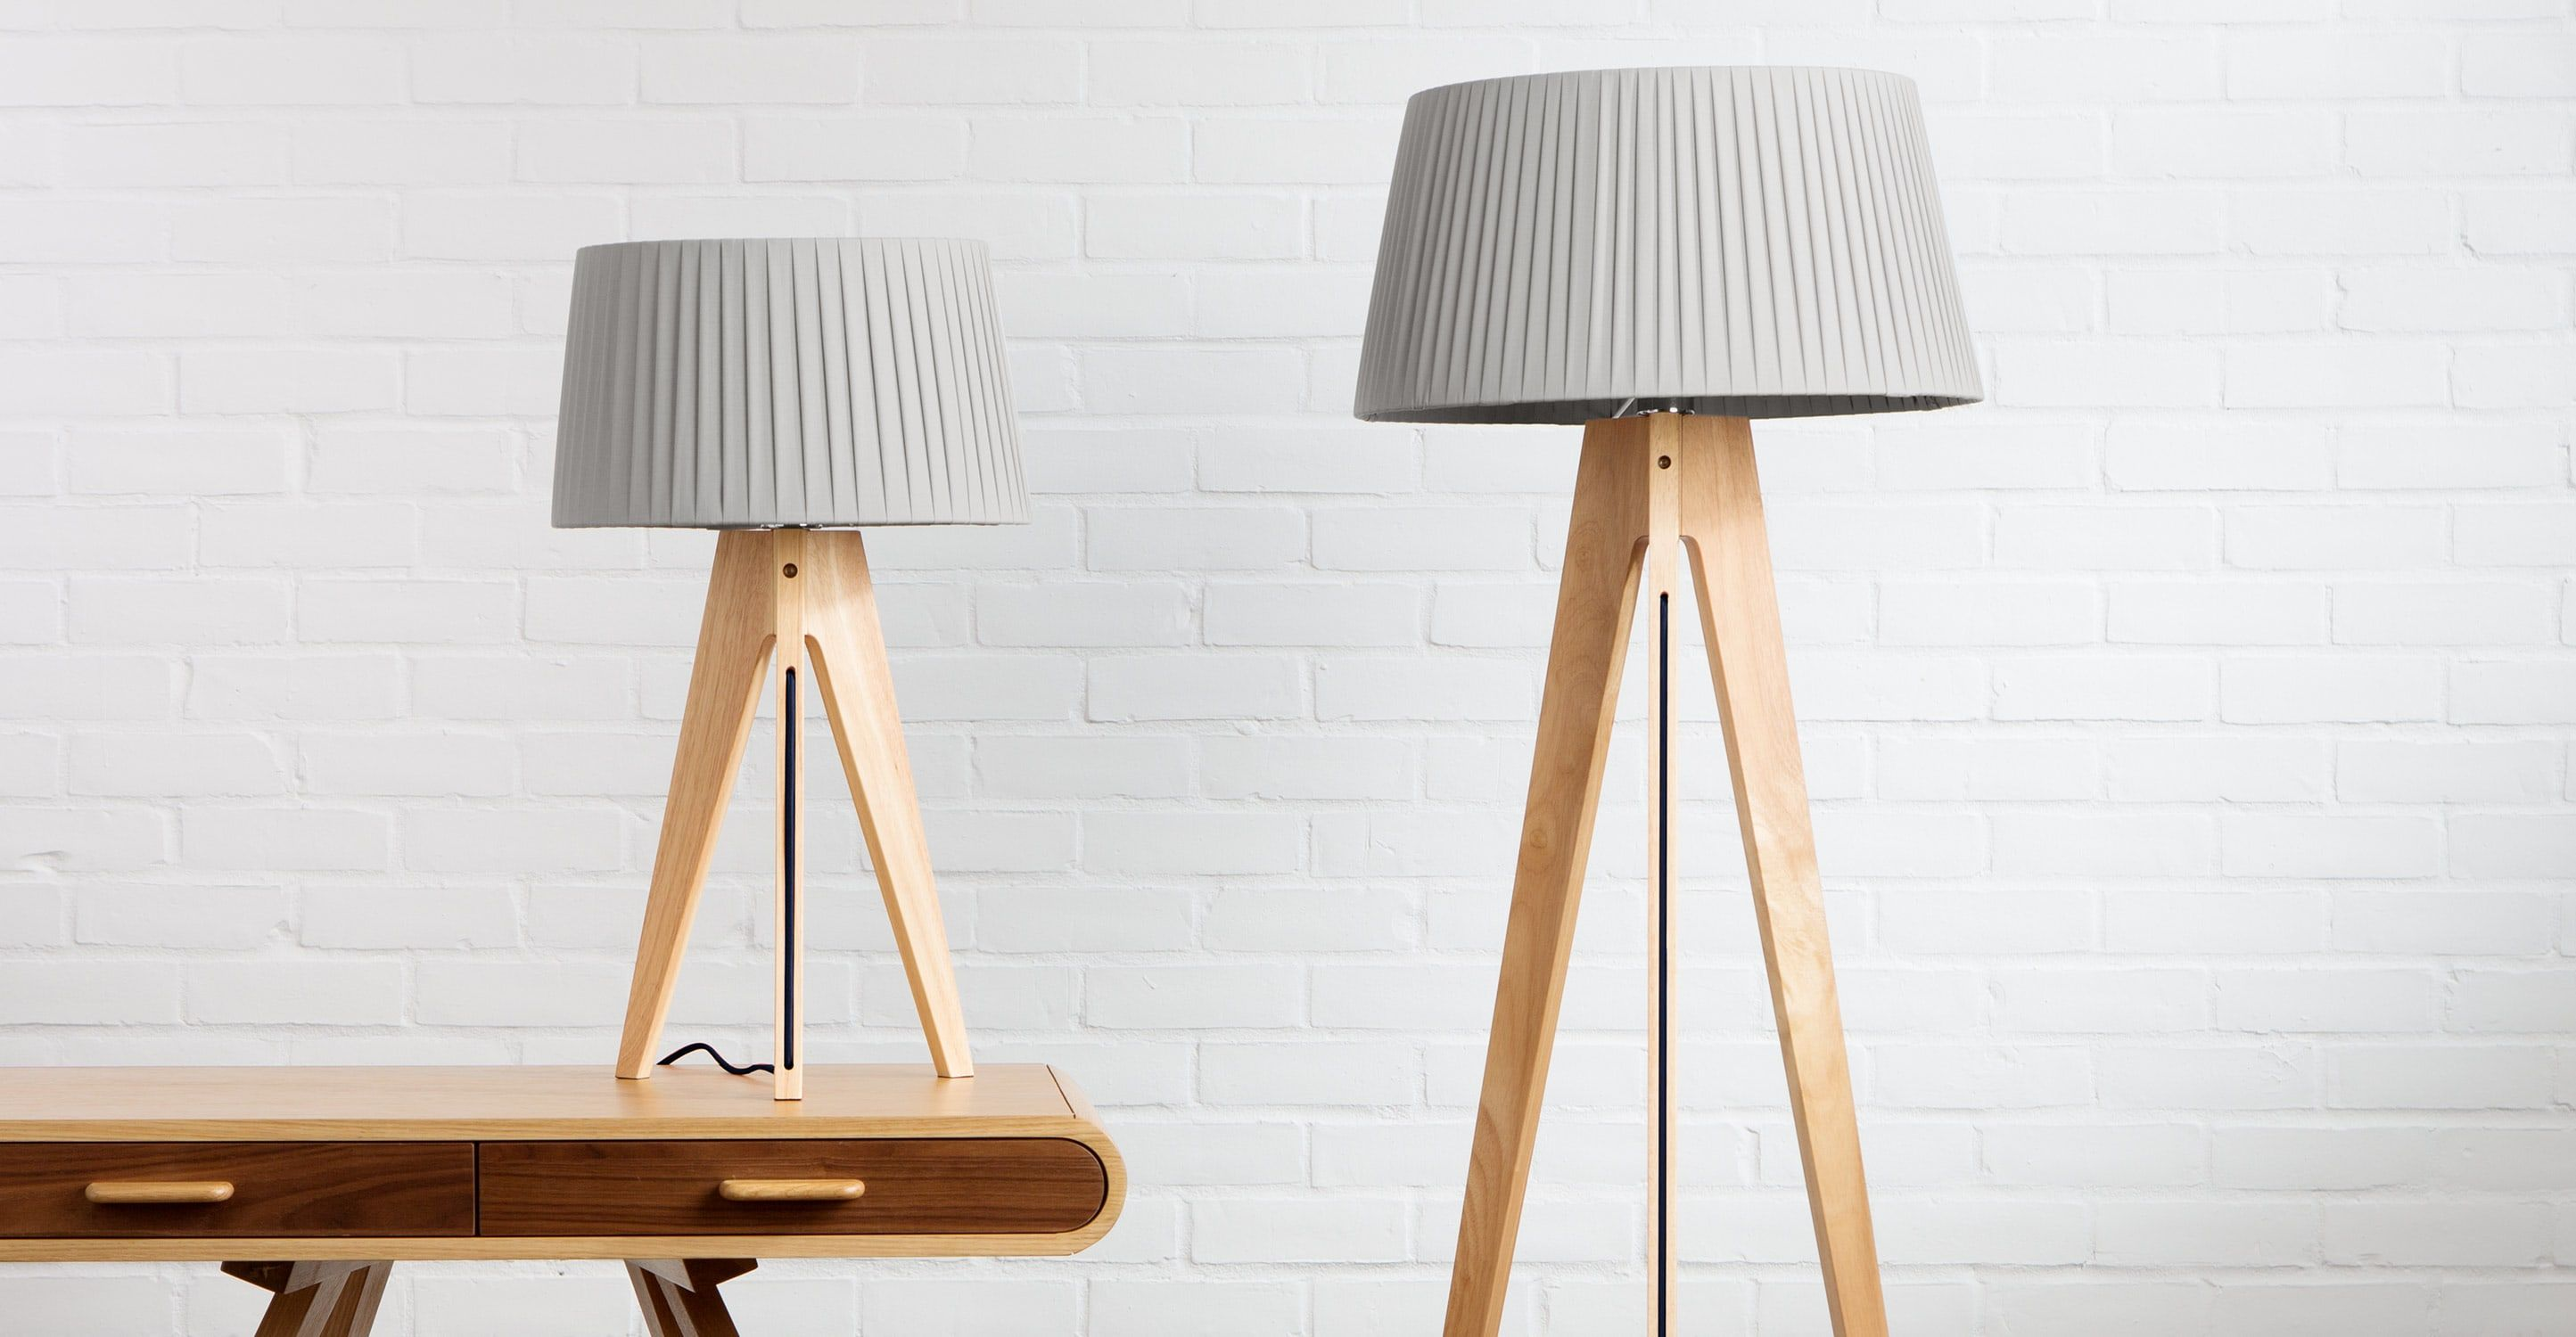 Miller un lampadaire bois naturel et bleu marine